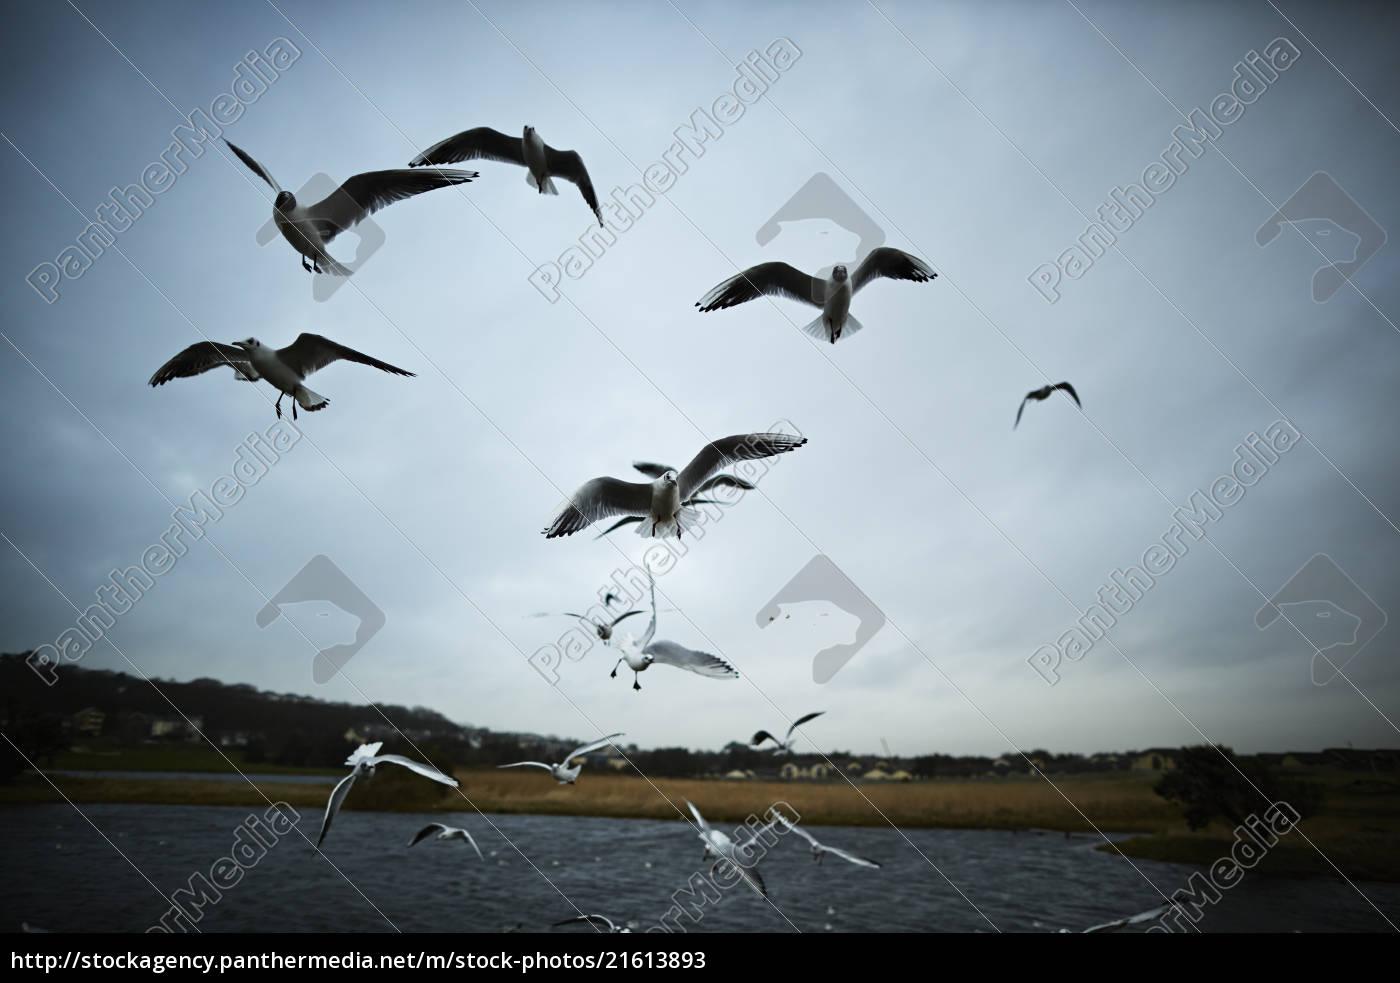 flock, of, seagulls, flying, near, lake - 21613893